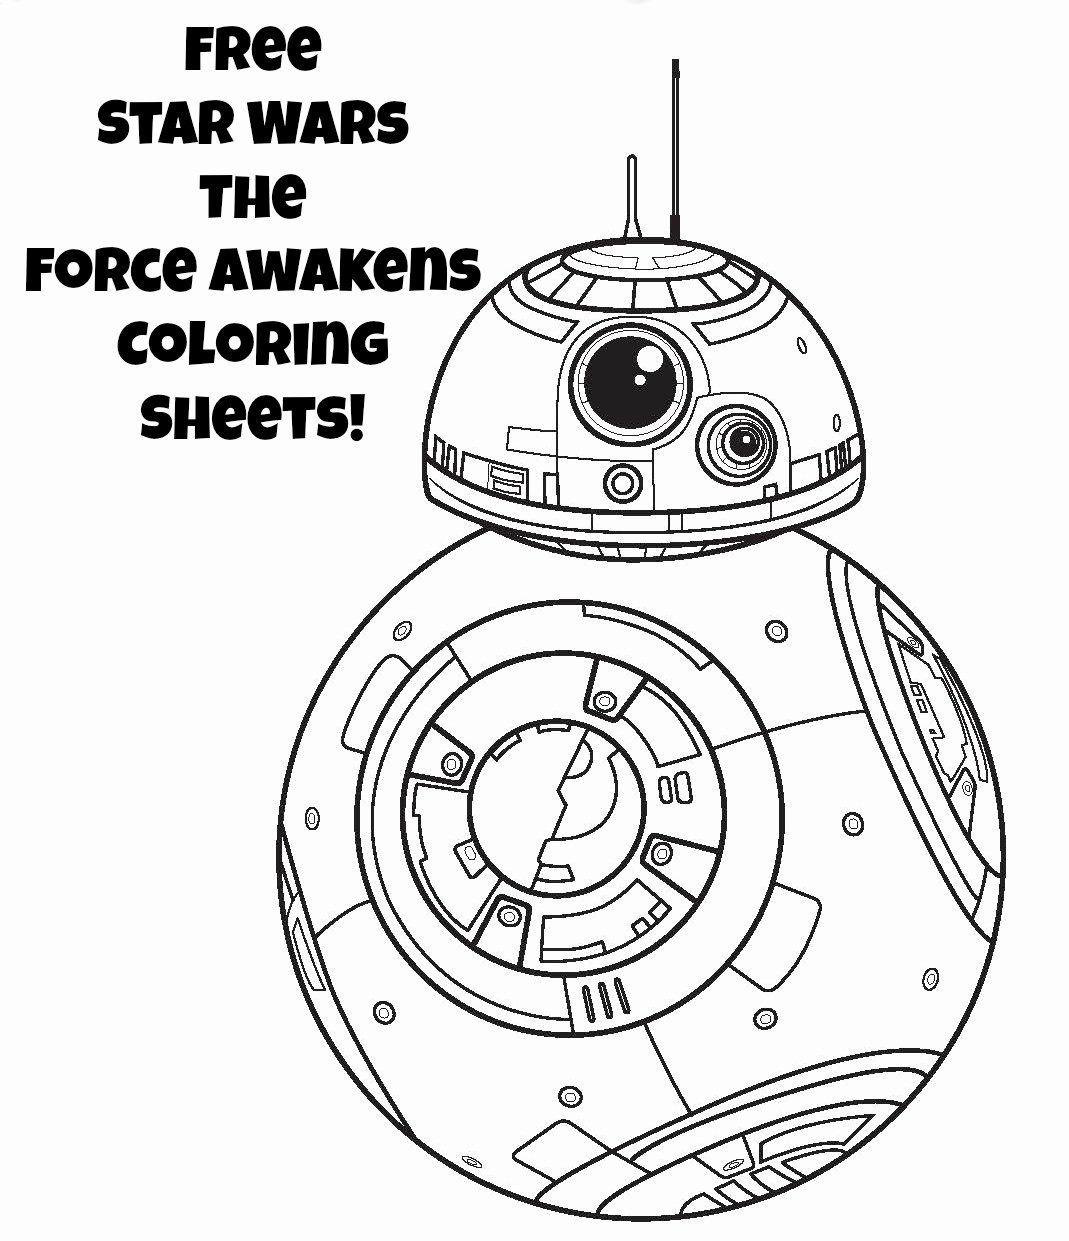 Star Wars Coloring Book Beautiful Star Wars Coloring Pages The Force Awakens Coloring Pages In 2020 Star Coloring Pages Star Wars Coloring Book Star Wars Colors